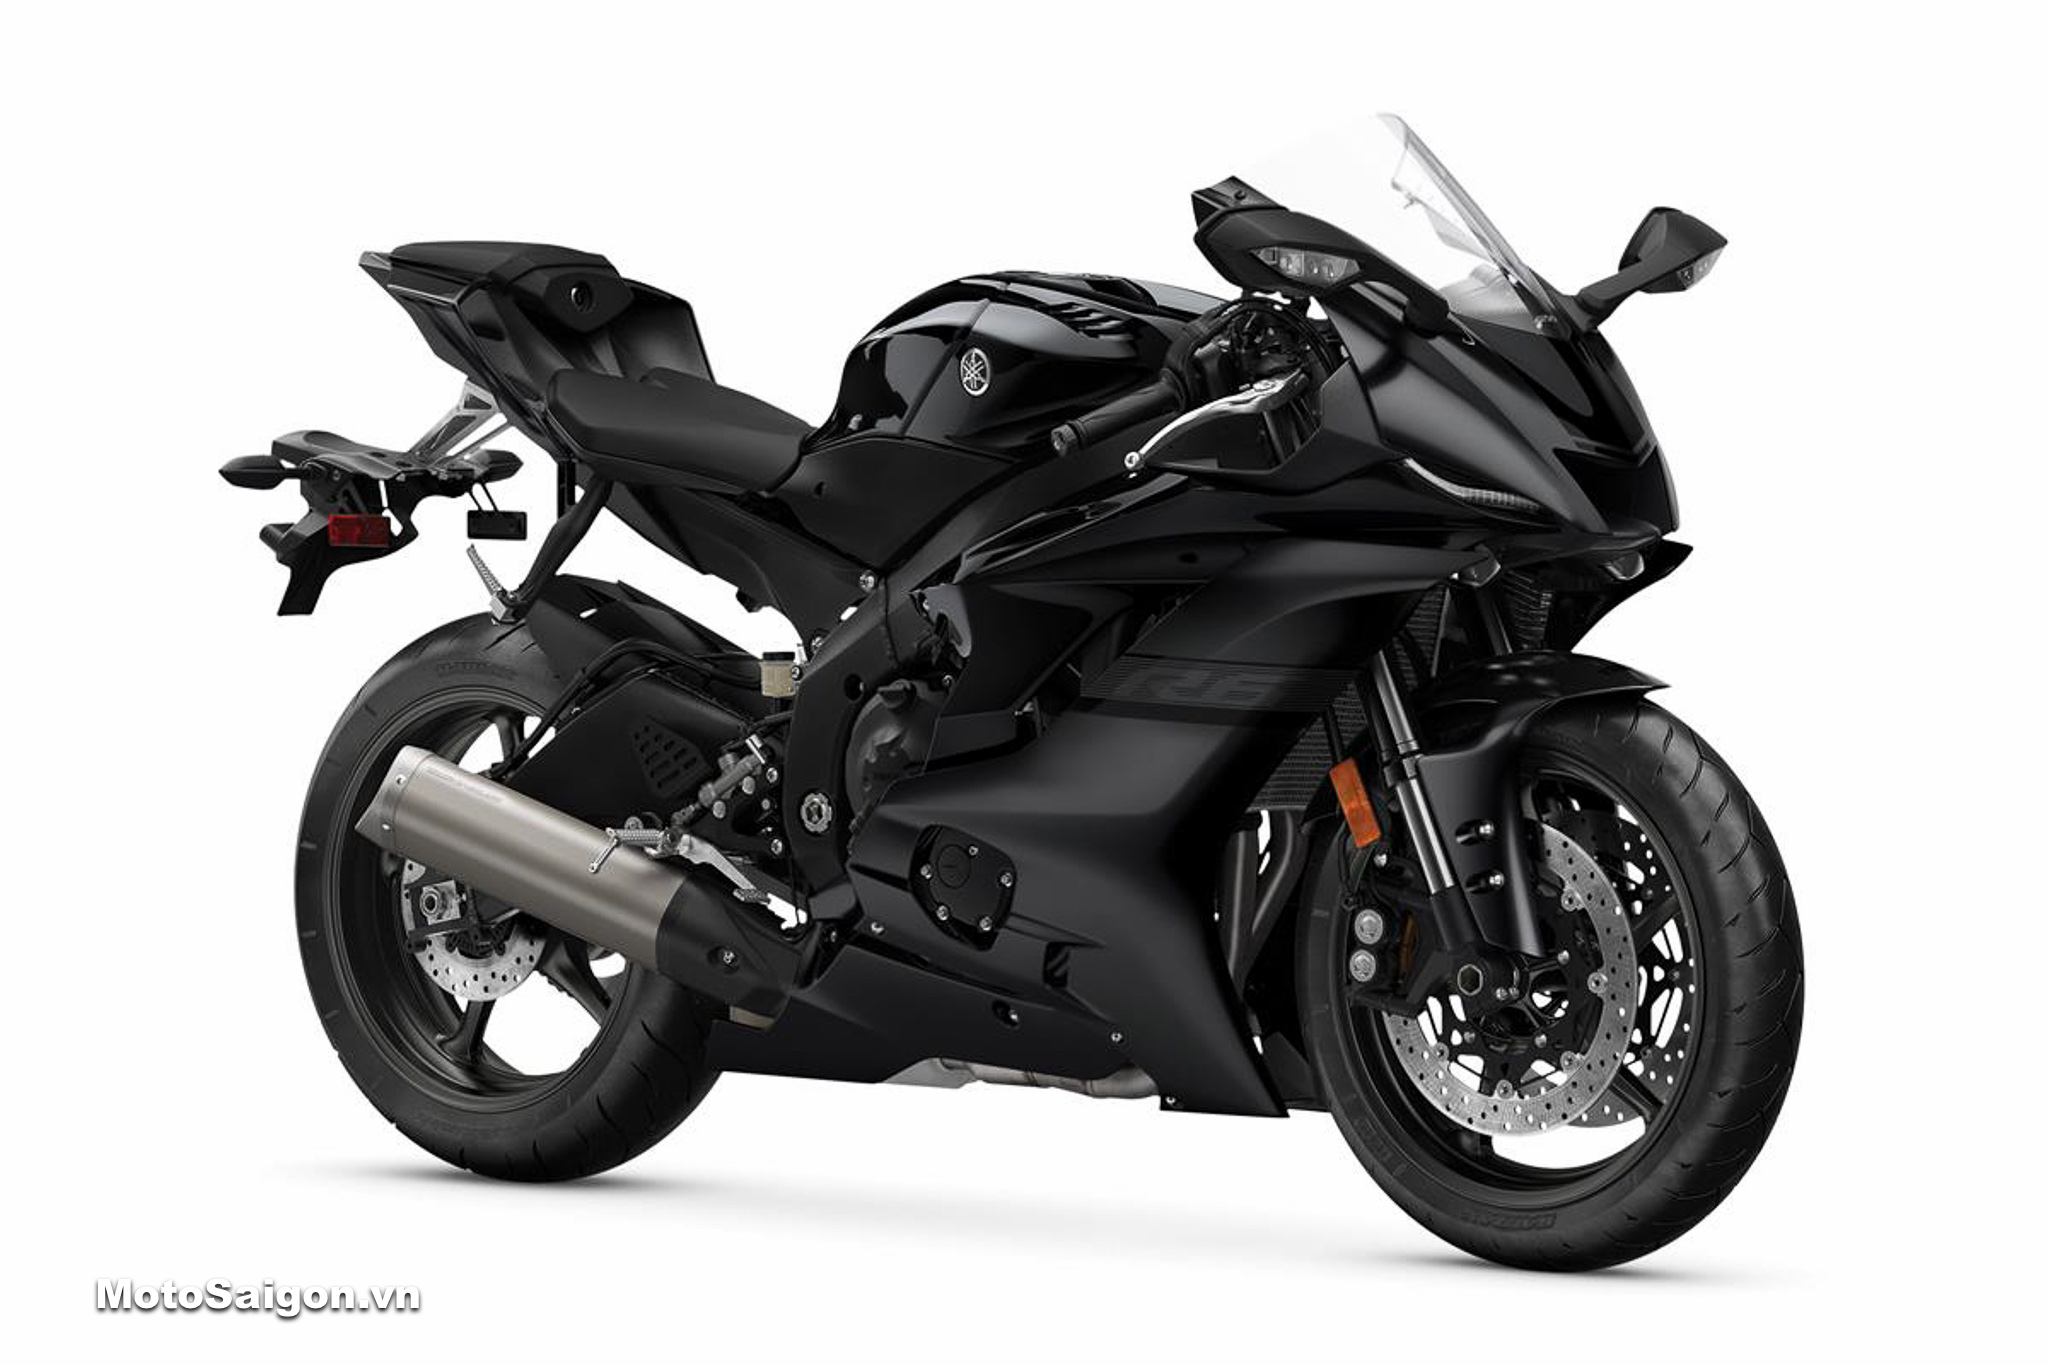 Yamaha R6 2020 màu đen Raven Black